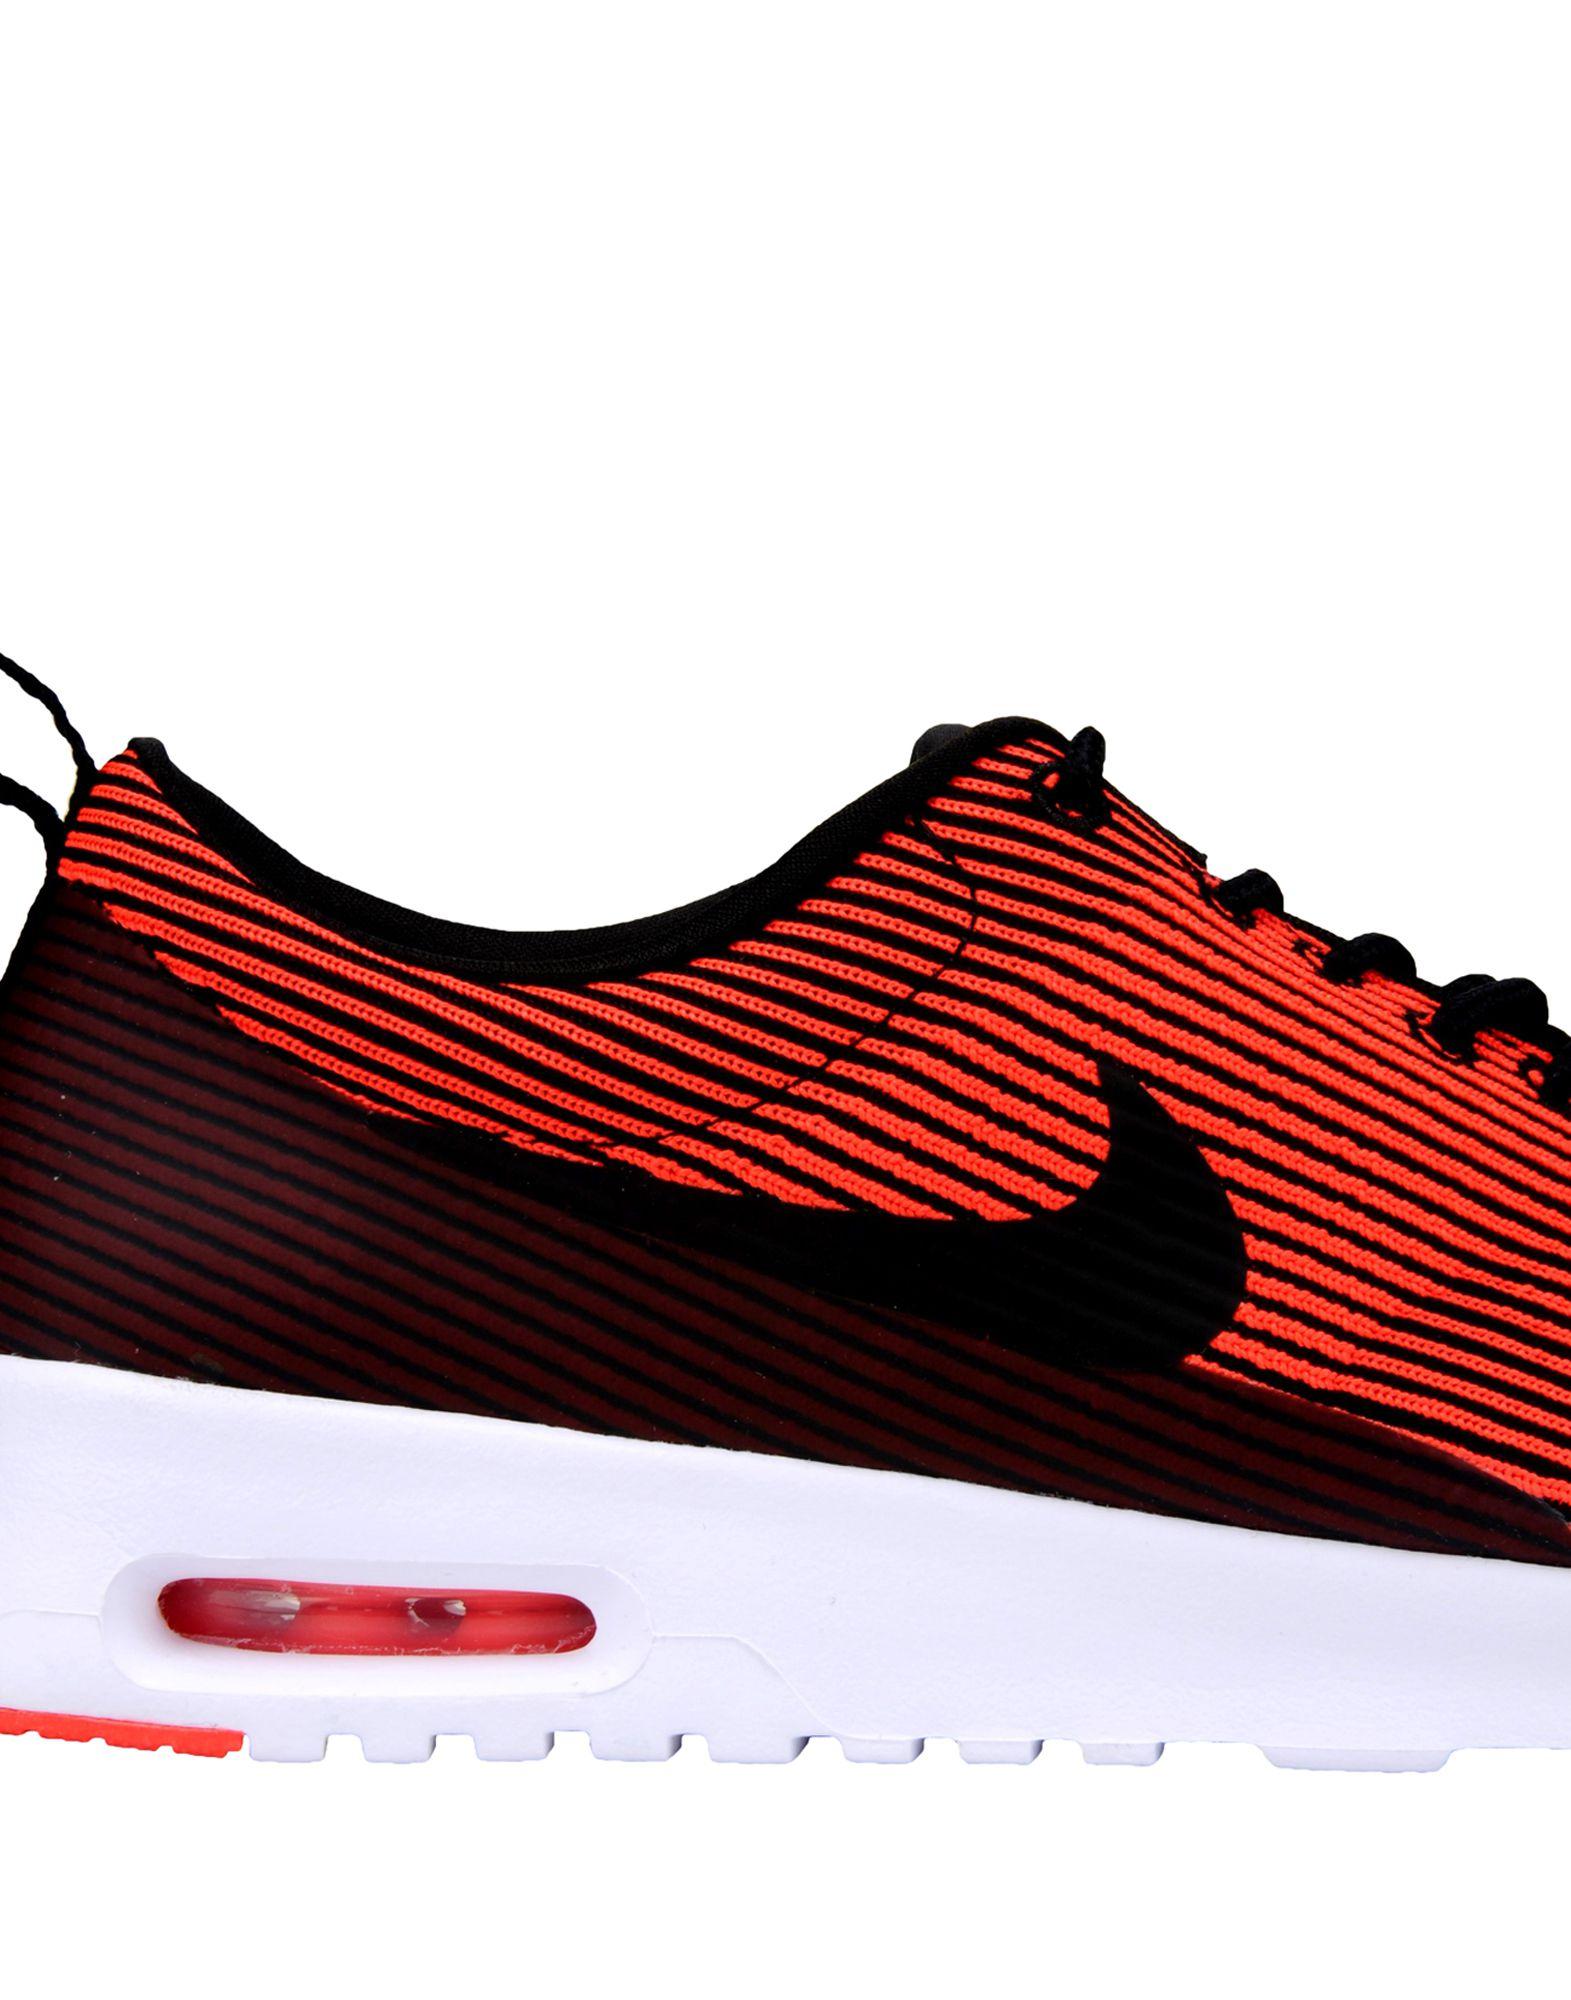 Nike W Nike Air Max Thea Kjcrd beliebte  44998351JR Gute Qualität beliebte Kjcrd Schuhe 542ab1